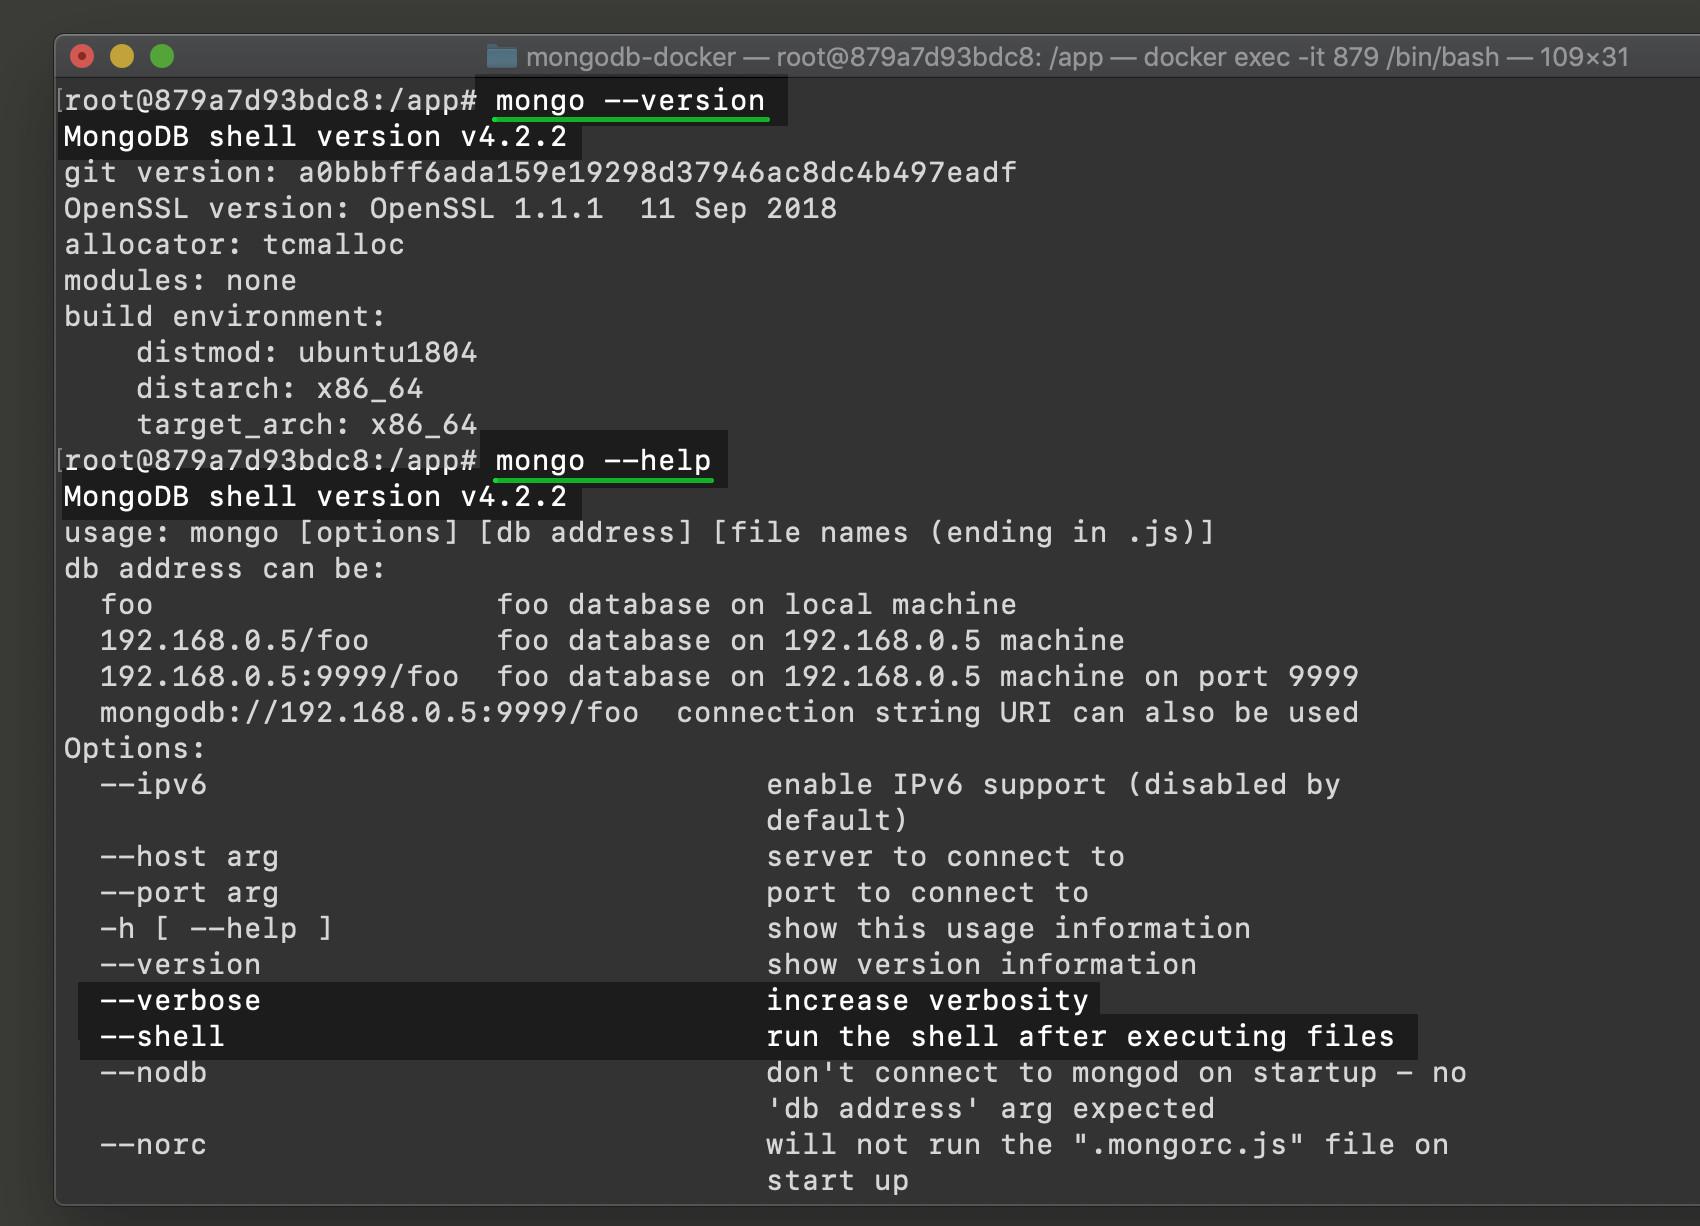 Terminal screenshot of mongo Shell version and help information